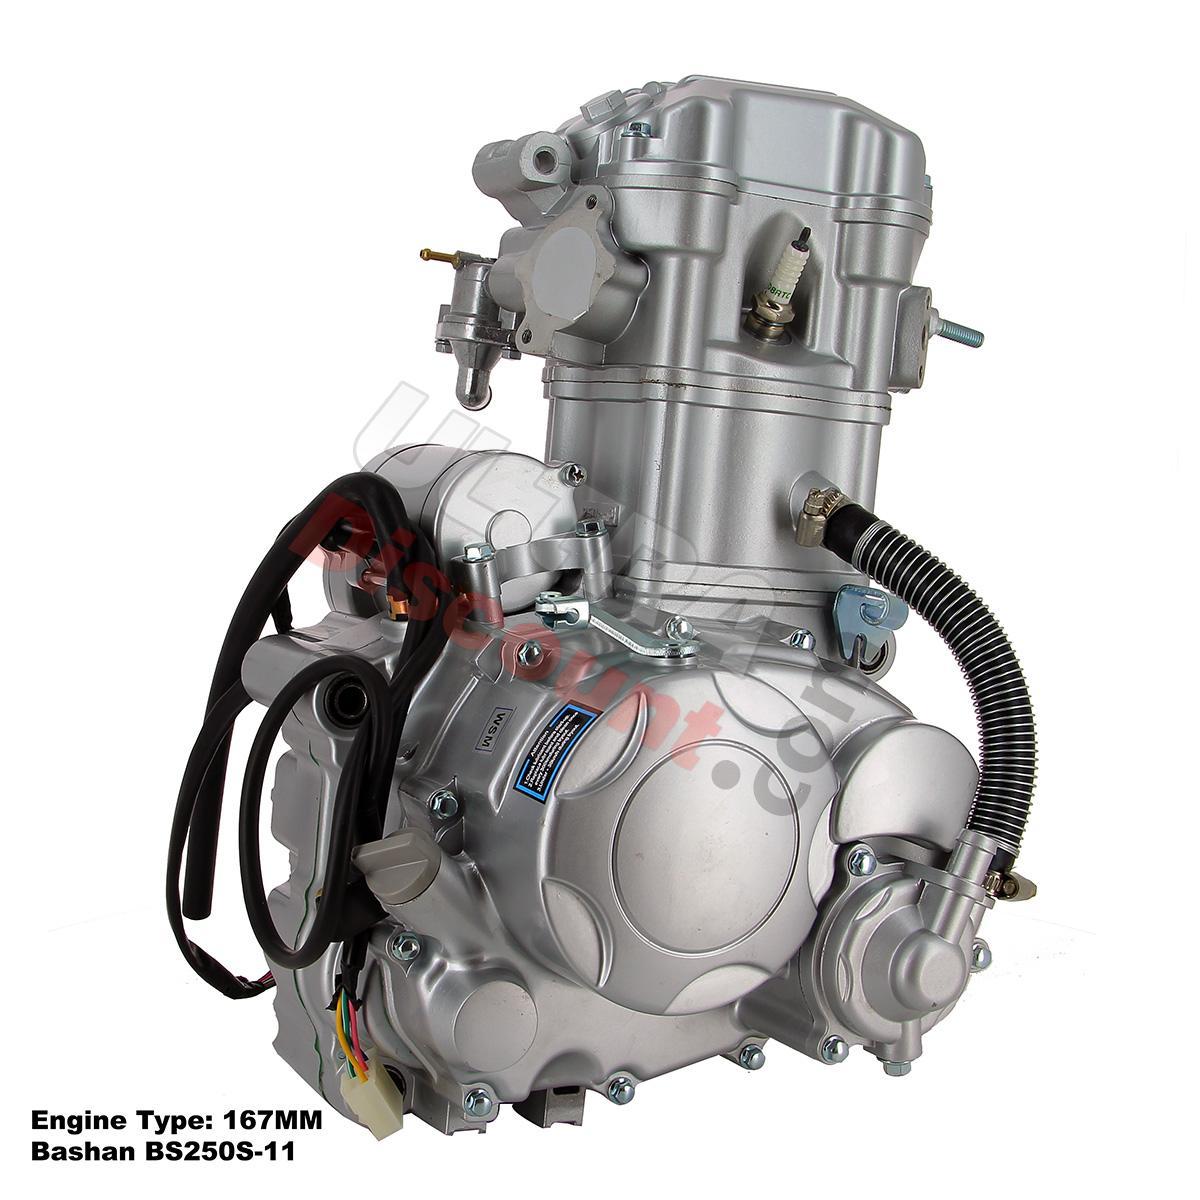 motor completo 167mm de quad bashan 250cc bs250s 11 motor piezas bashan 250cc bs250s11. Black Bedroom Furniture Sets. Home Design Ideas